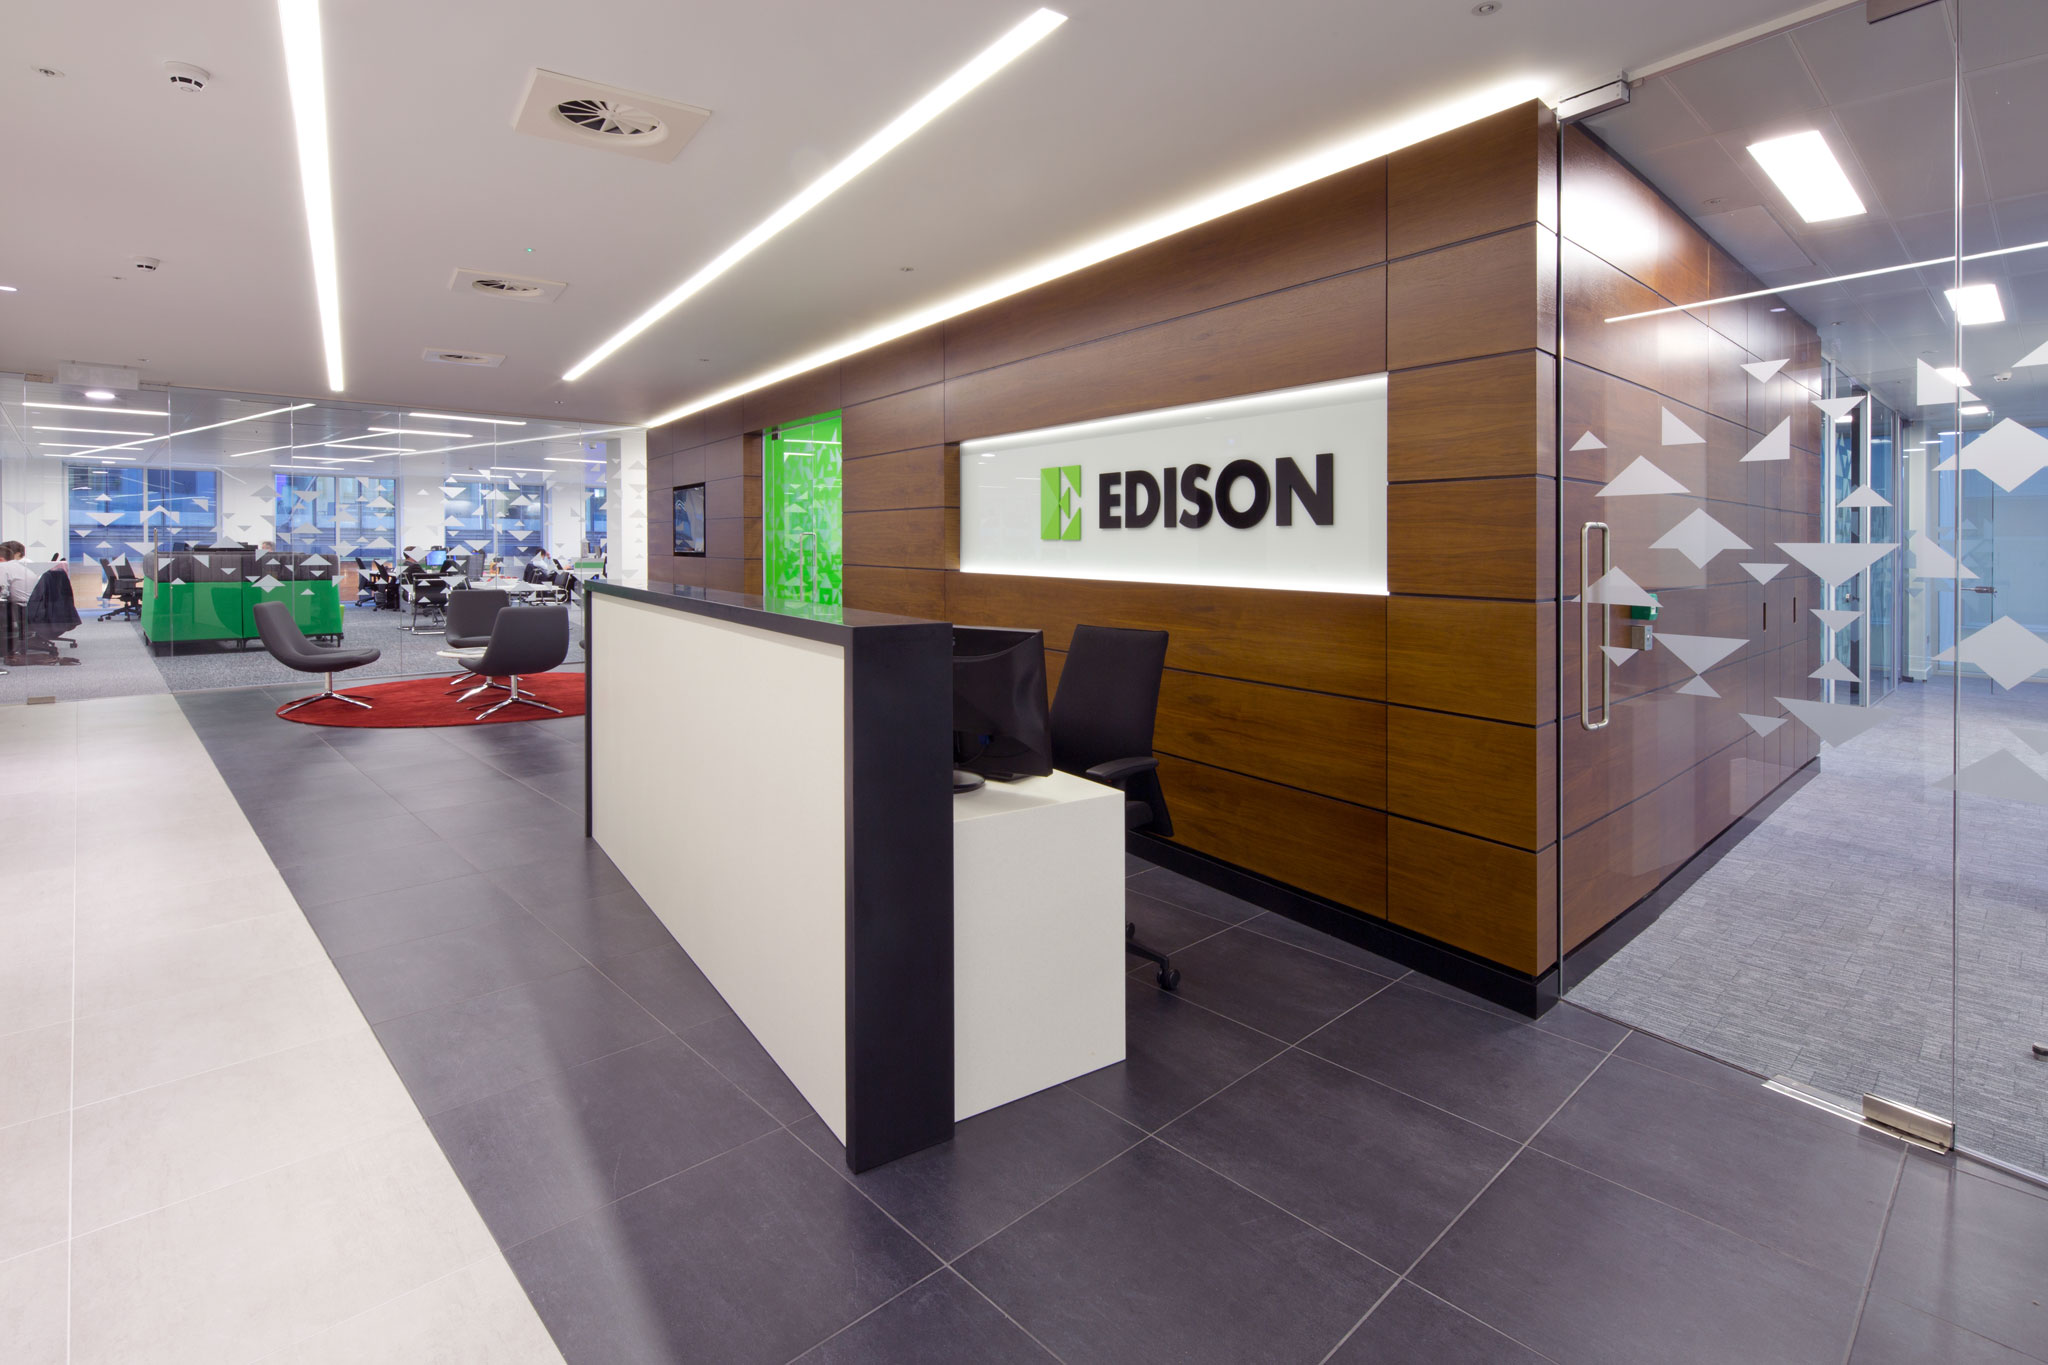 Edison_reception.jpg